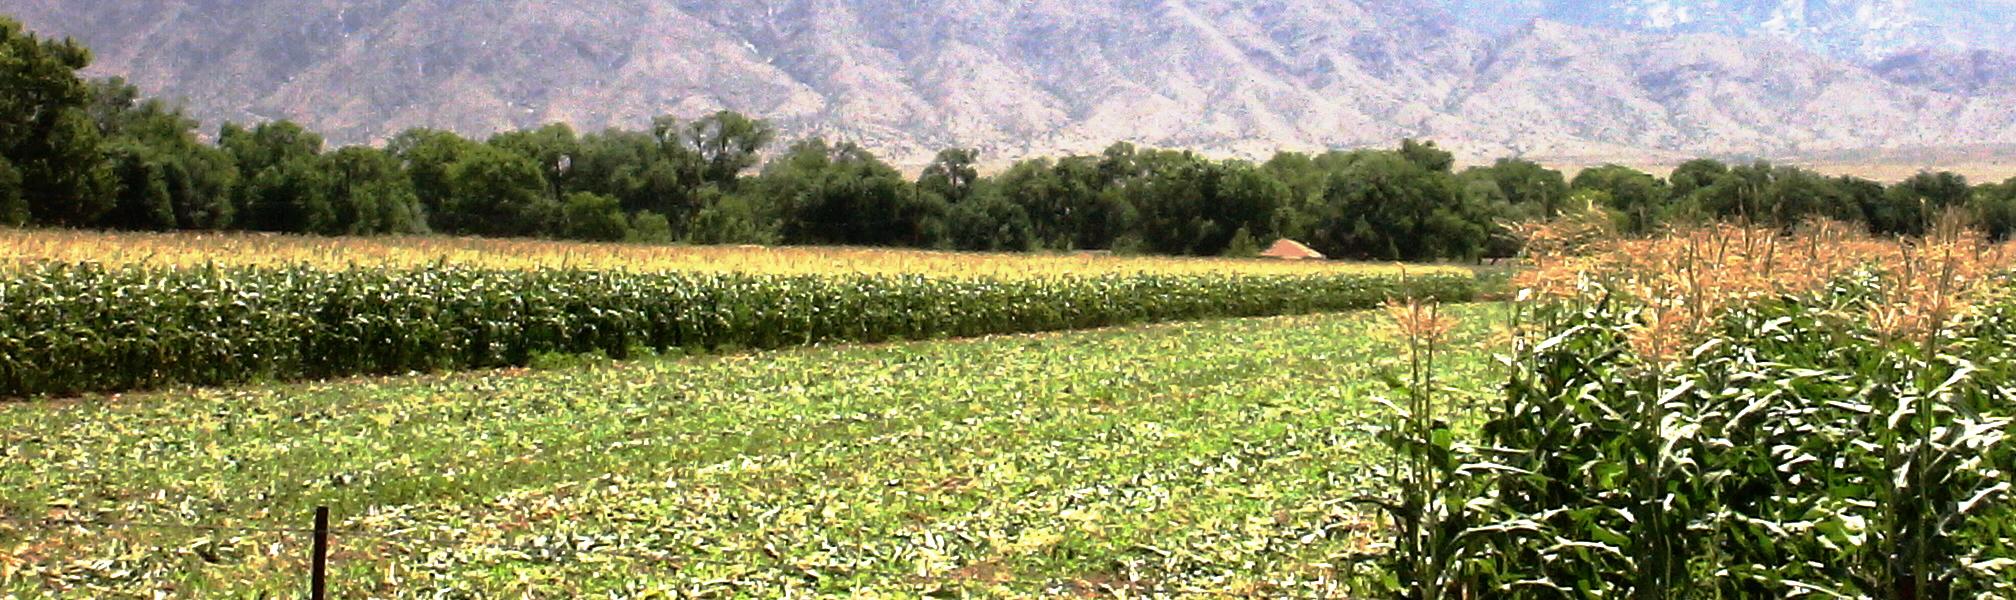 Corrales New Mexico